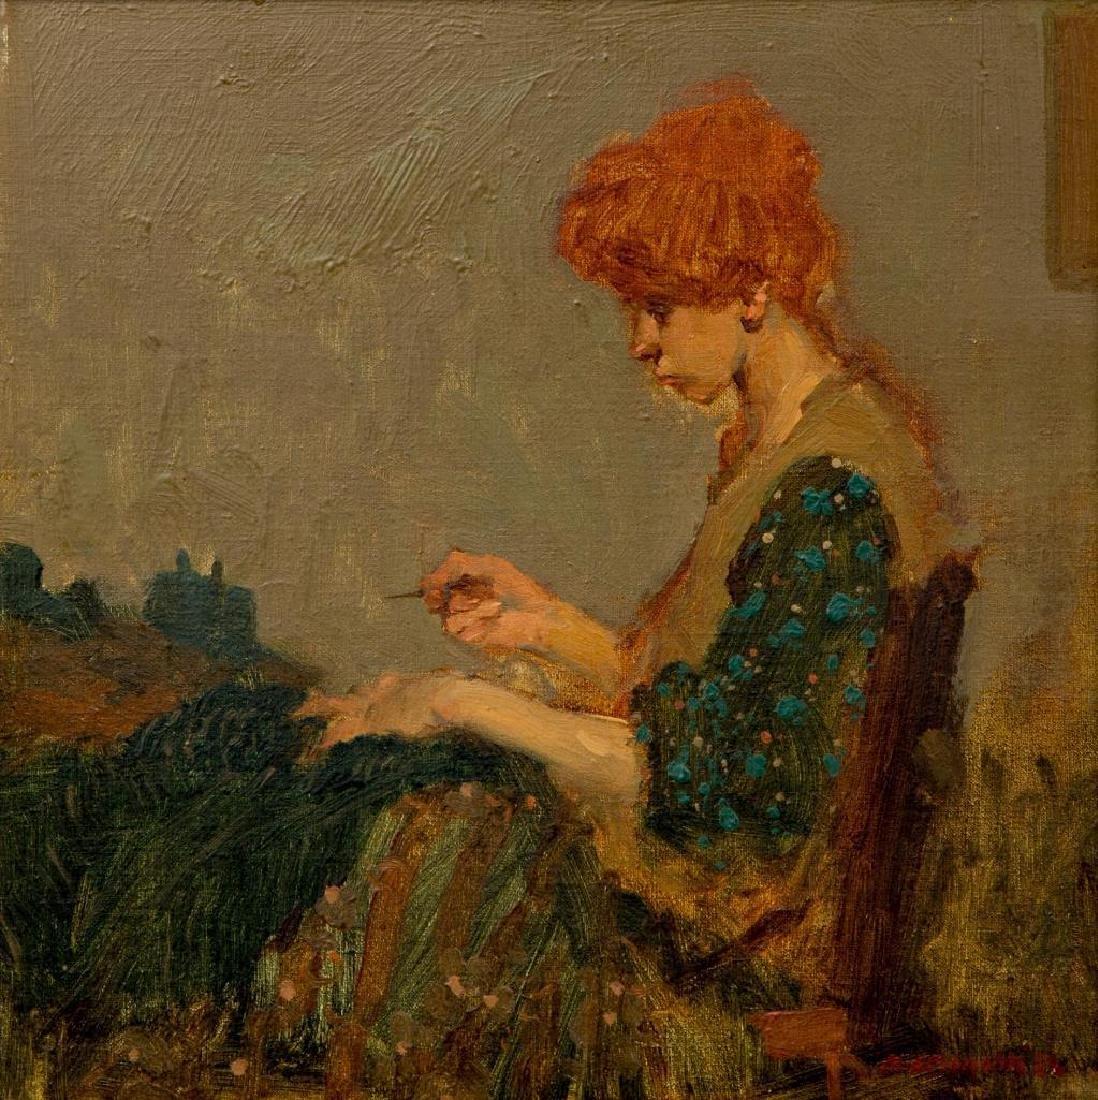 MILT KOBAYASHI (b. 1950) OIL ON CANVAS 'WOMAN SEWING'